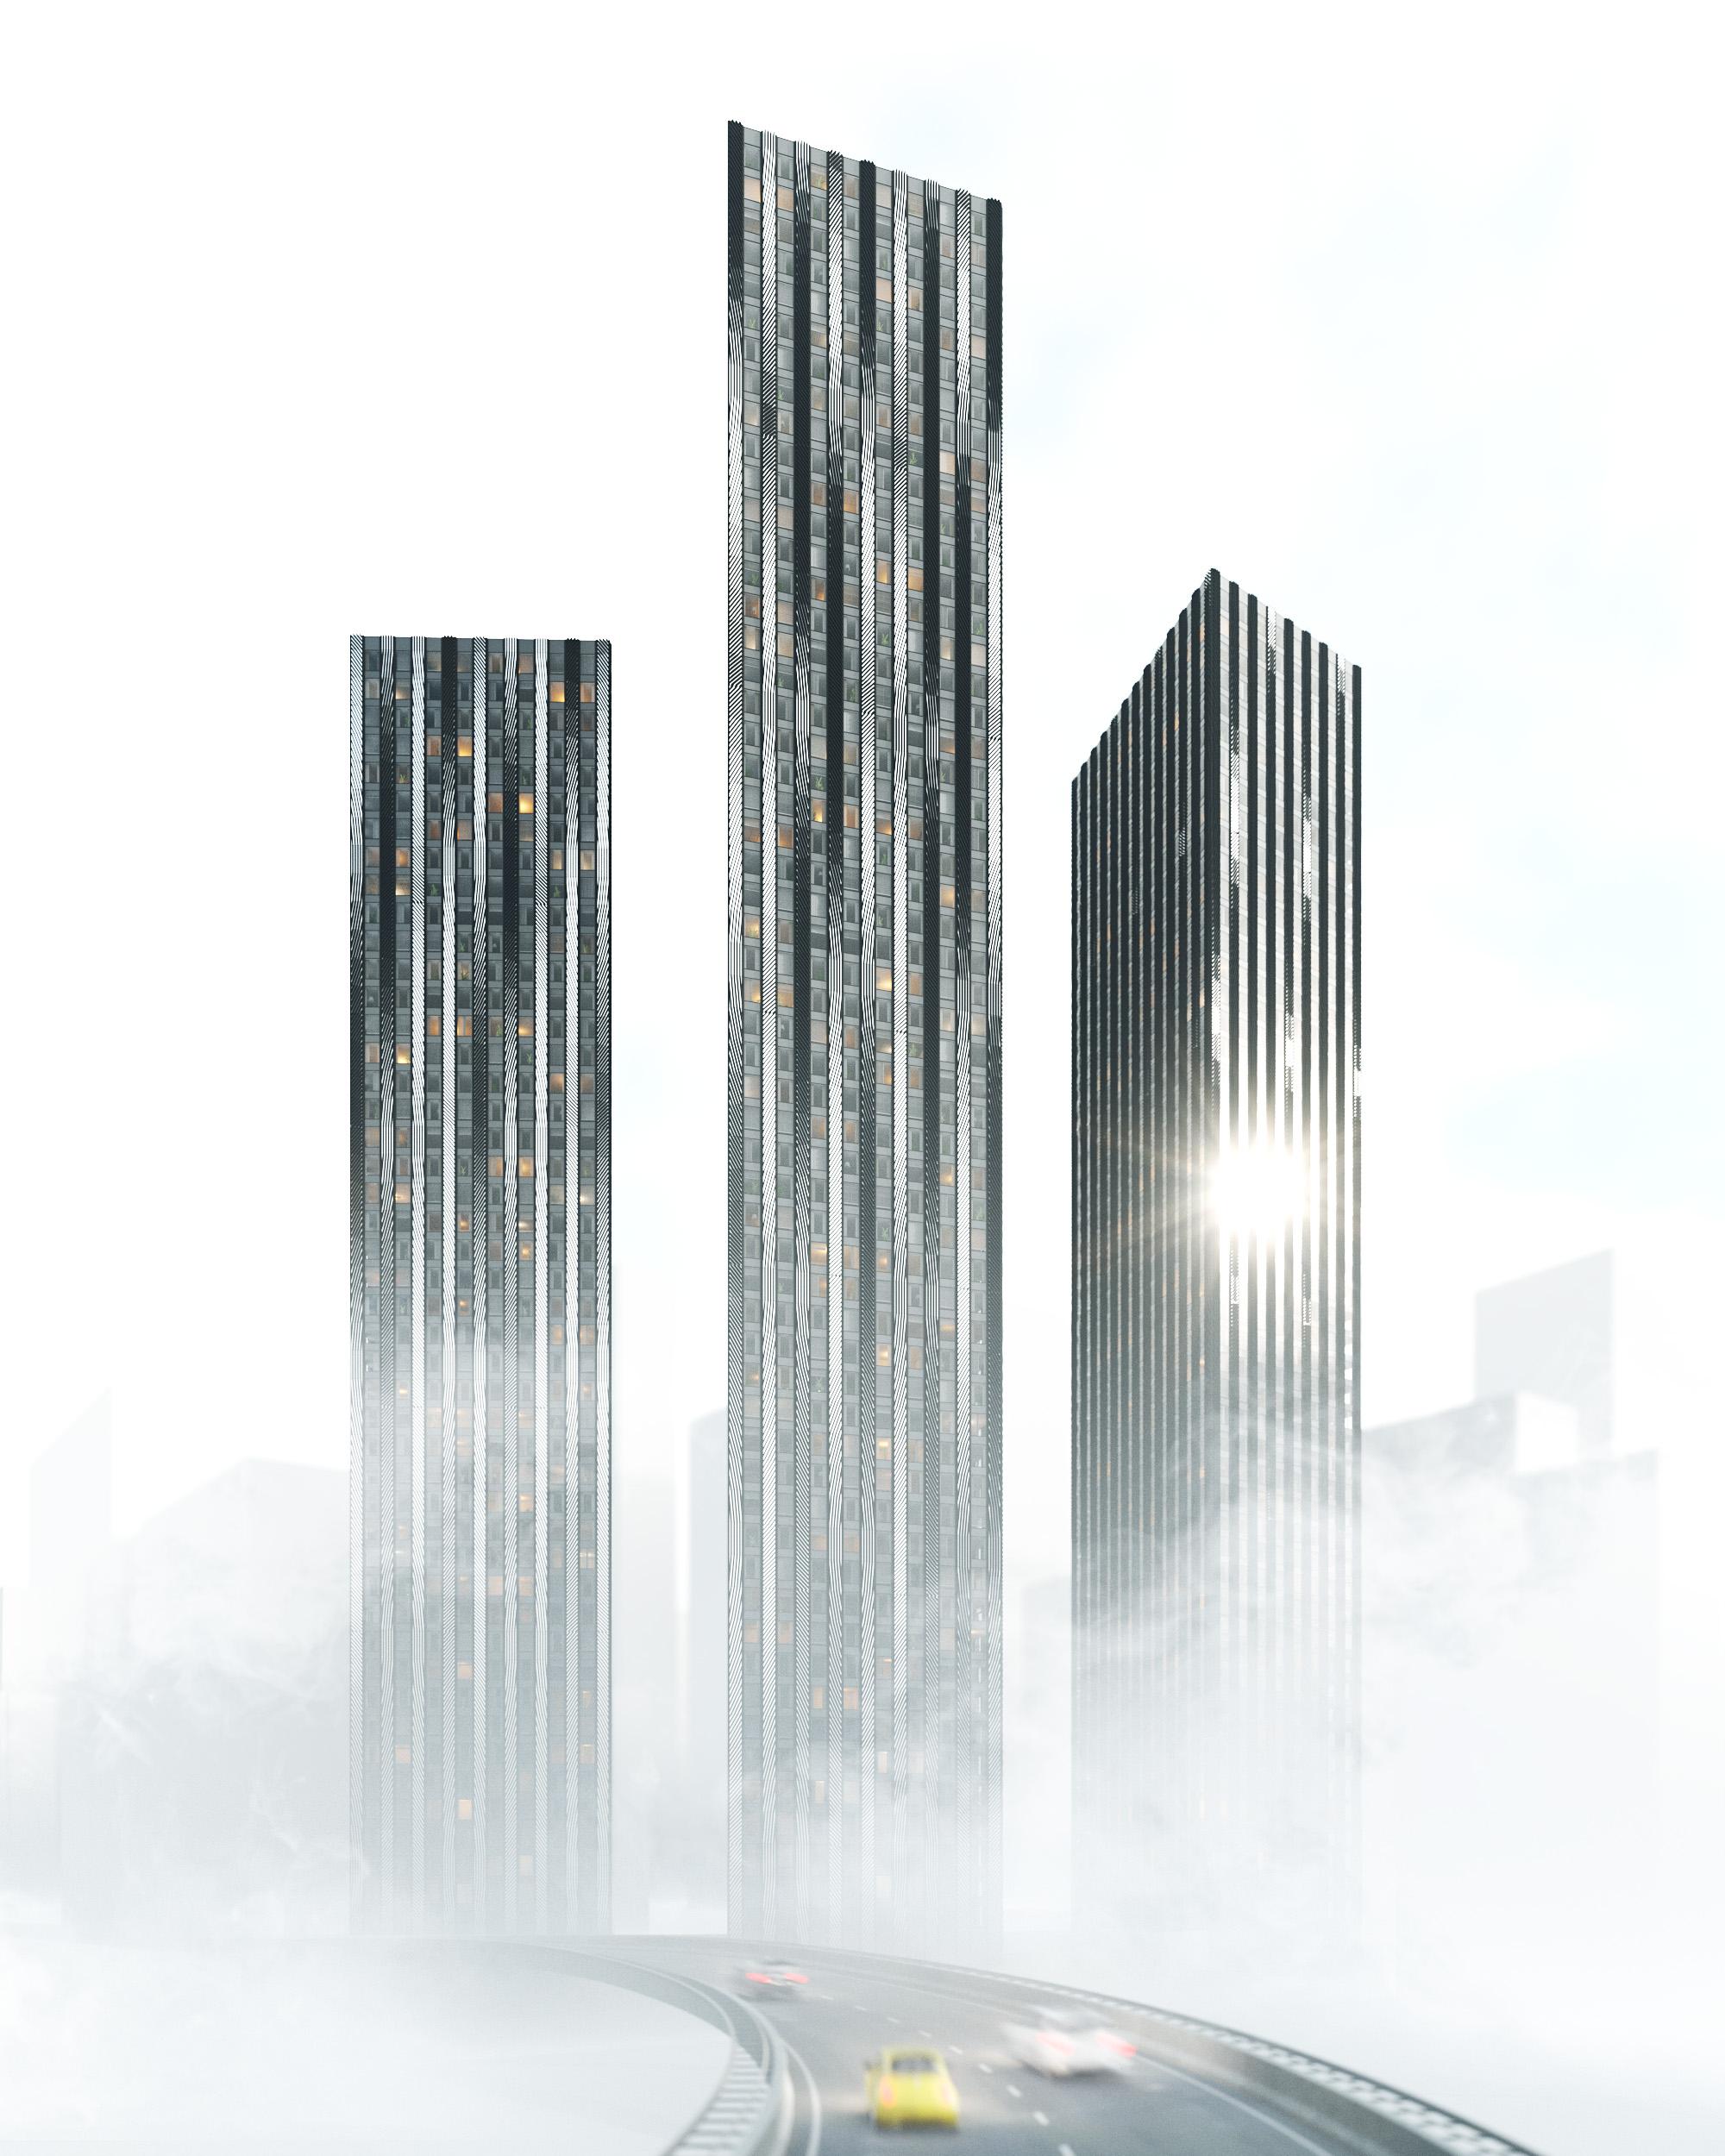 modern architecture skyscrapers. Modren Skyscrapers Modern Architecture Skyscrapers Artistic Director  Skyscrapers To Modern Architecture Skyscrapers